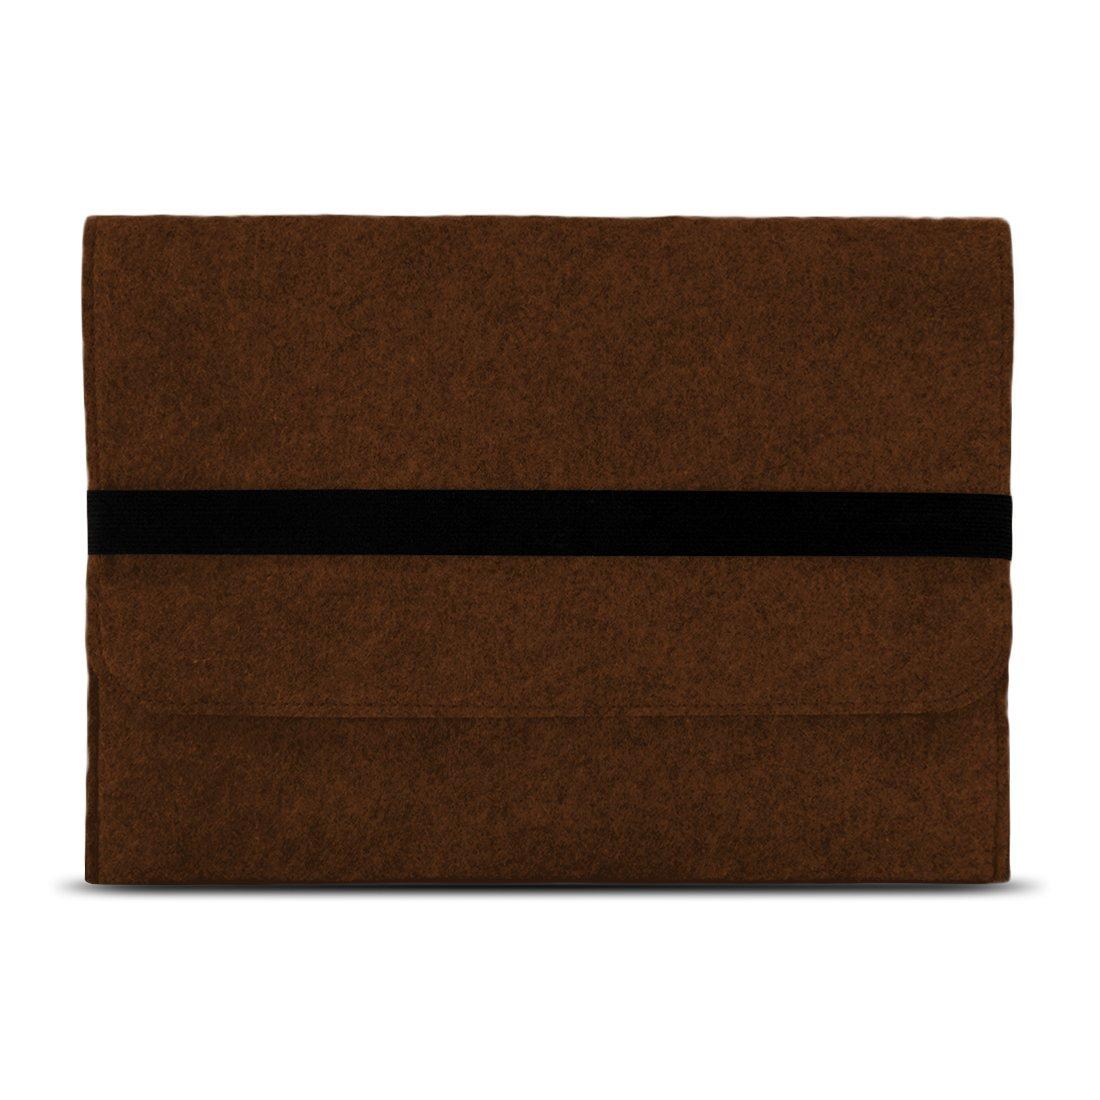 NAUC Notebook Tasche kompatibel f/ür Lenovo Yoga 520 14 Zoll H/ülle Filz Sleeve Case Schutzh/ülle Cover Farben:Braun